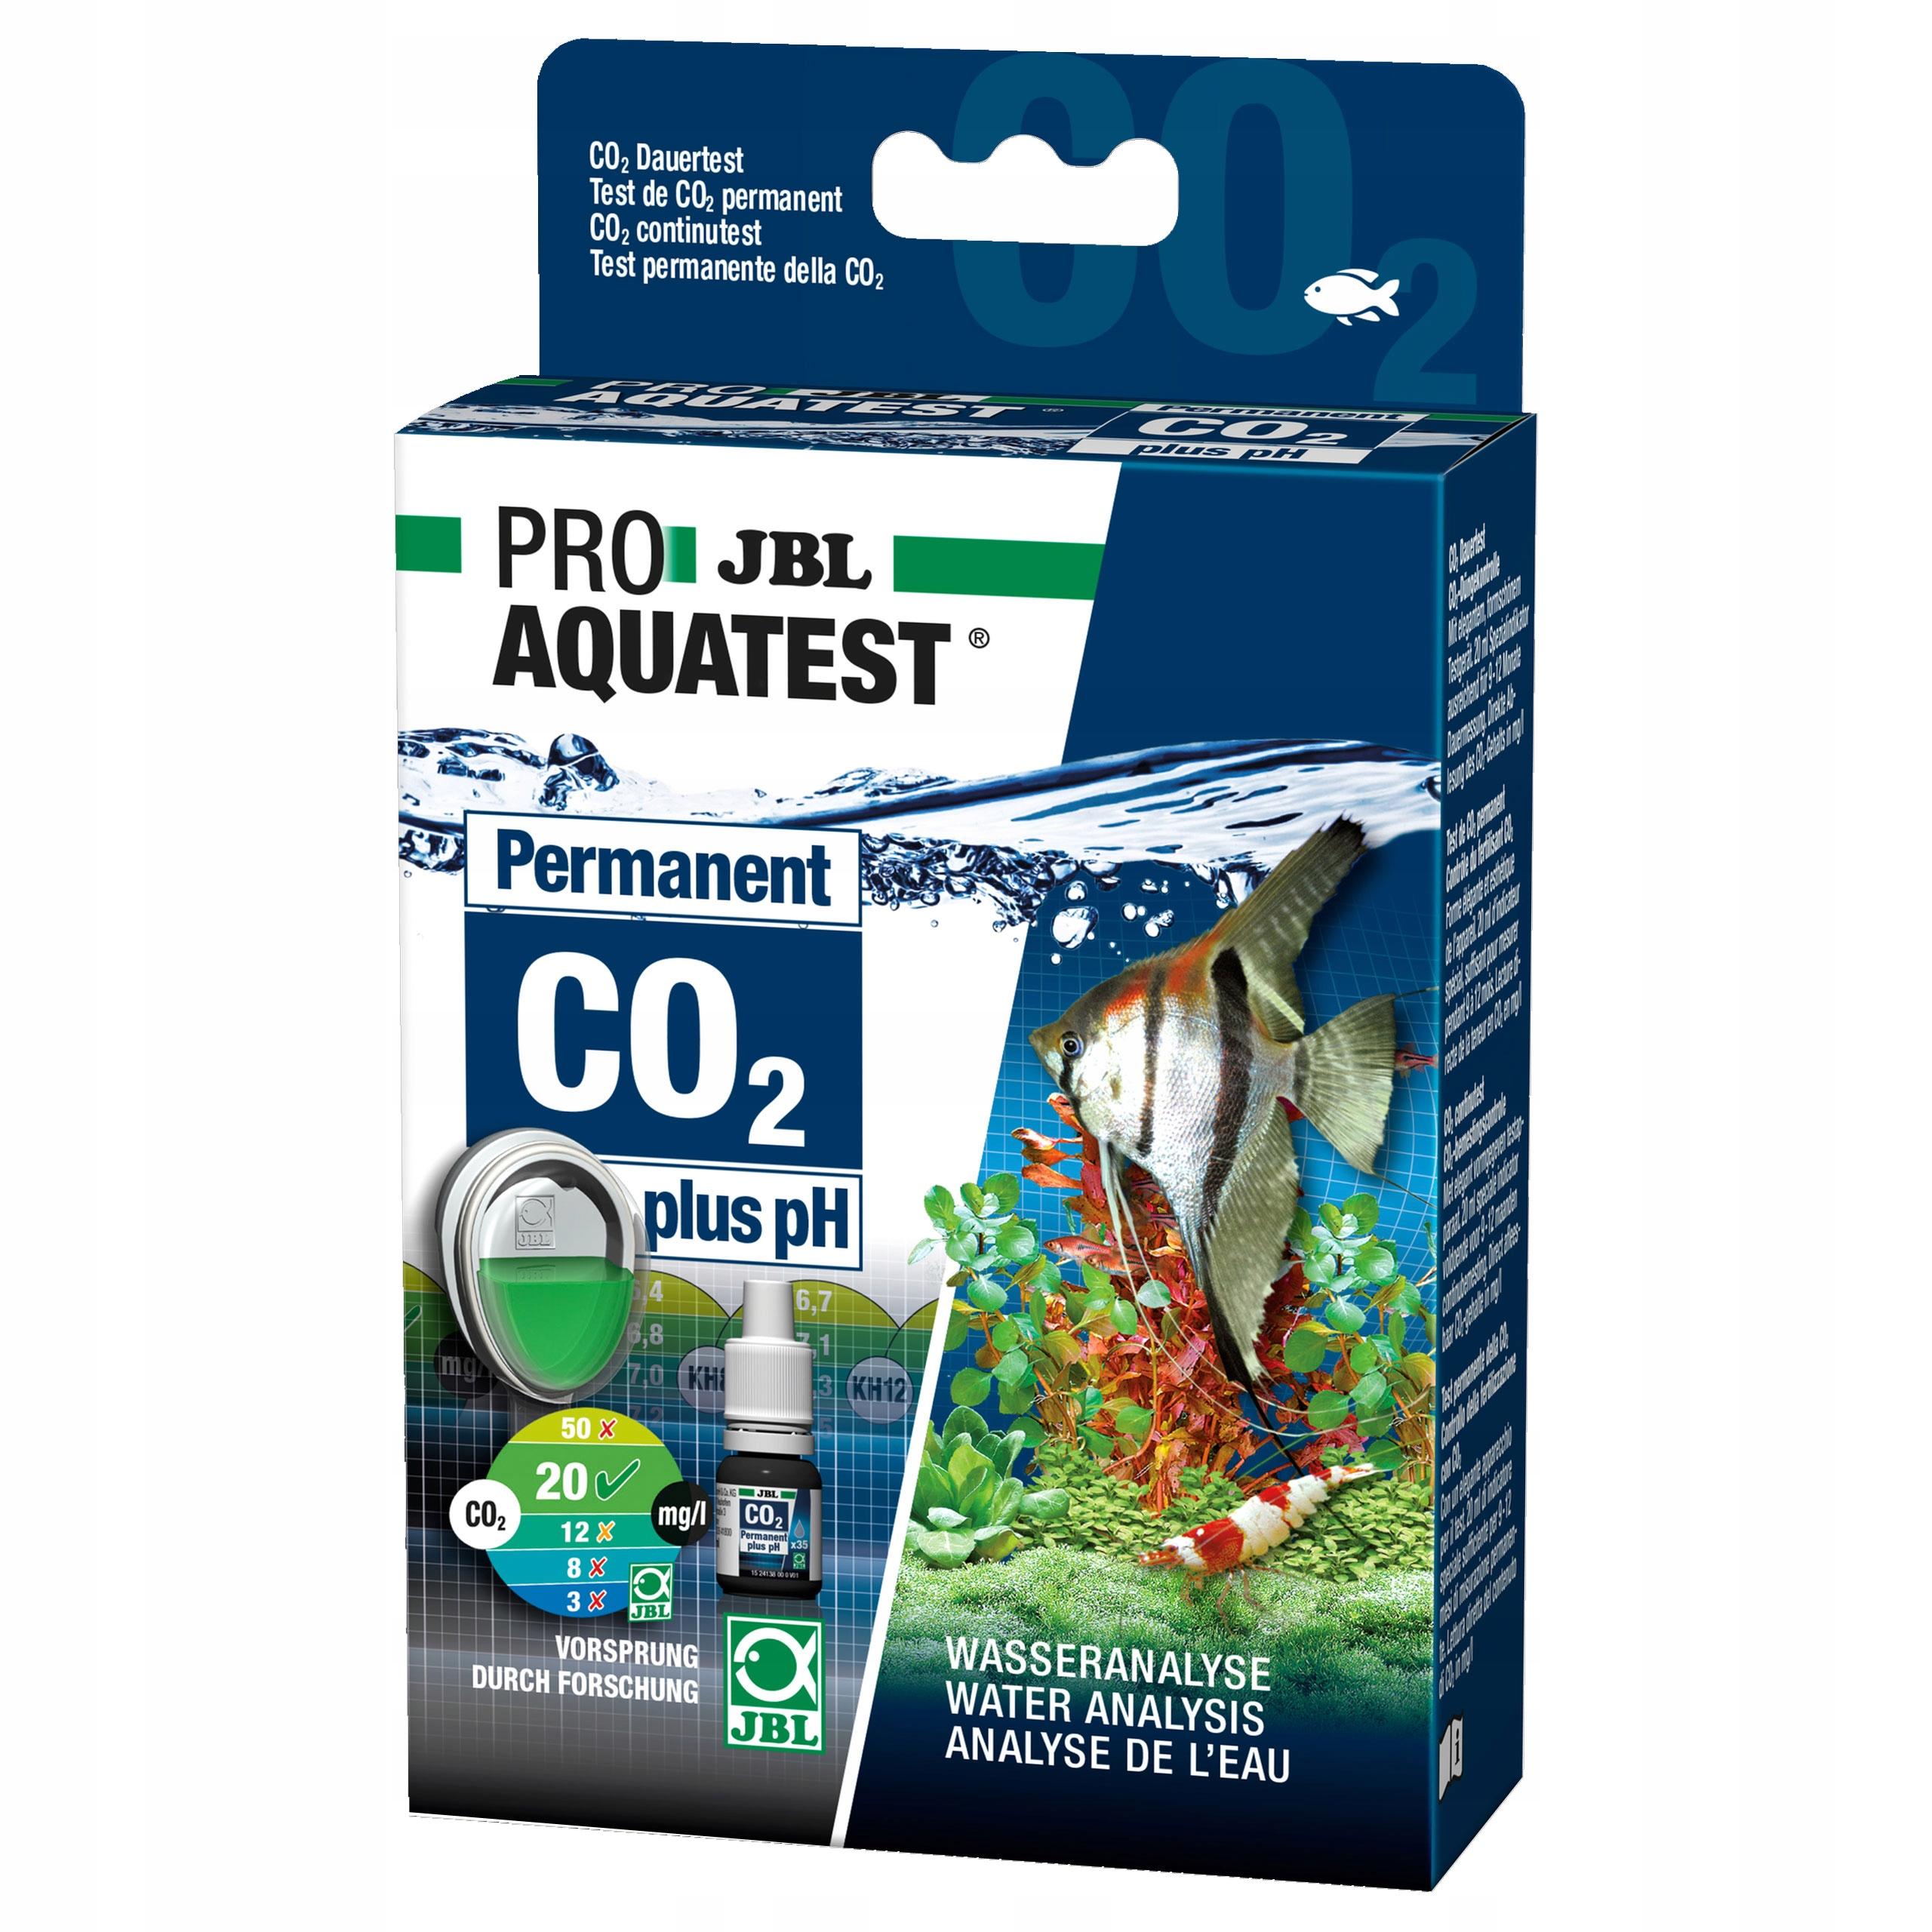 PROAQUATEST JBL CO2 pH Trvalé test Set 2